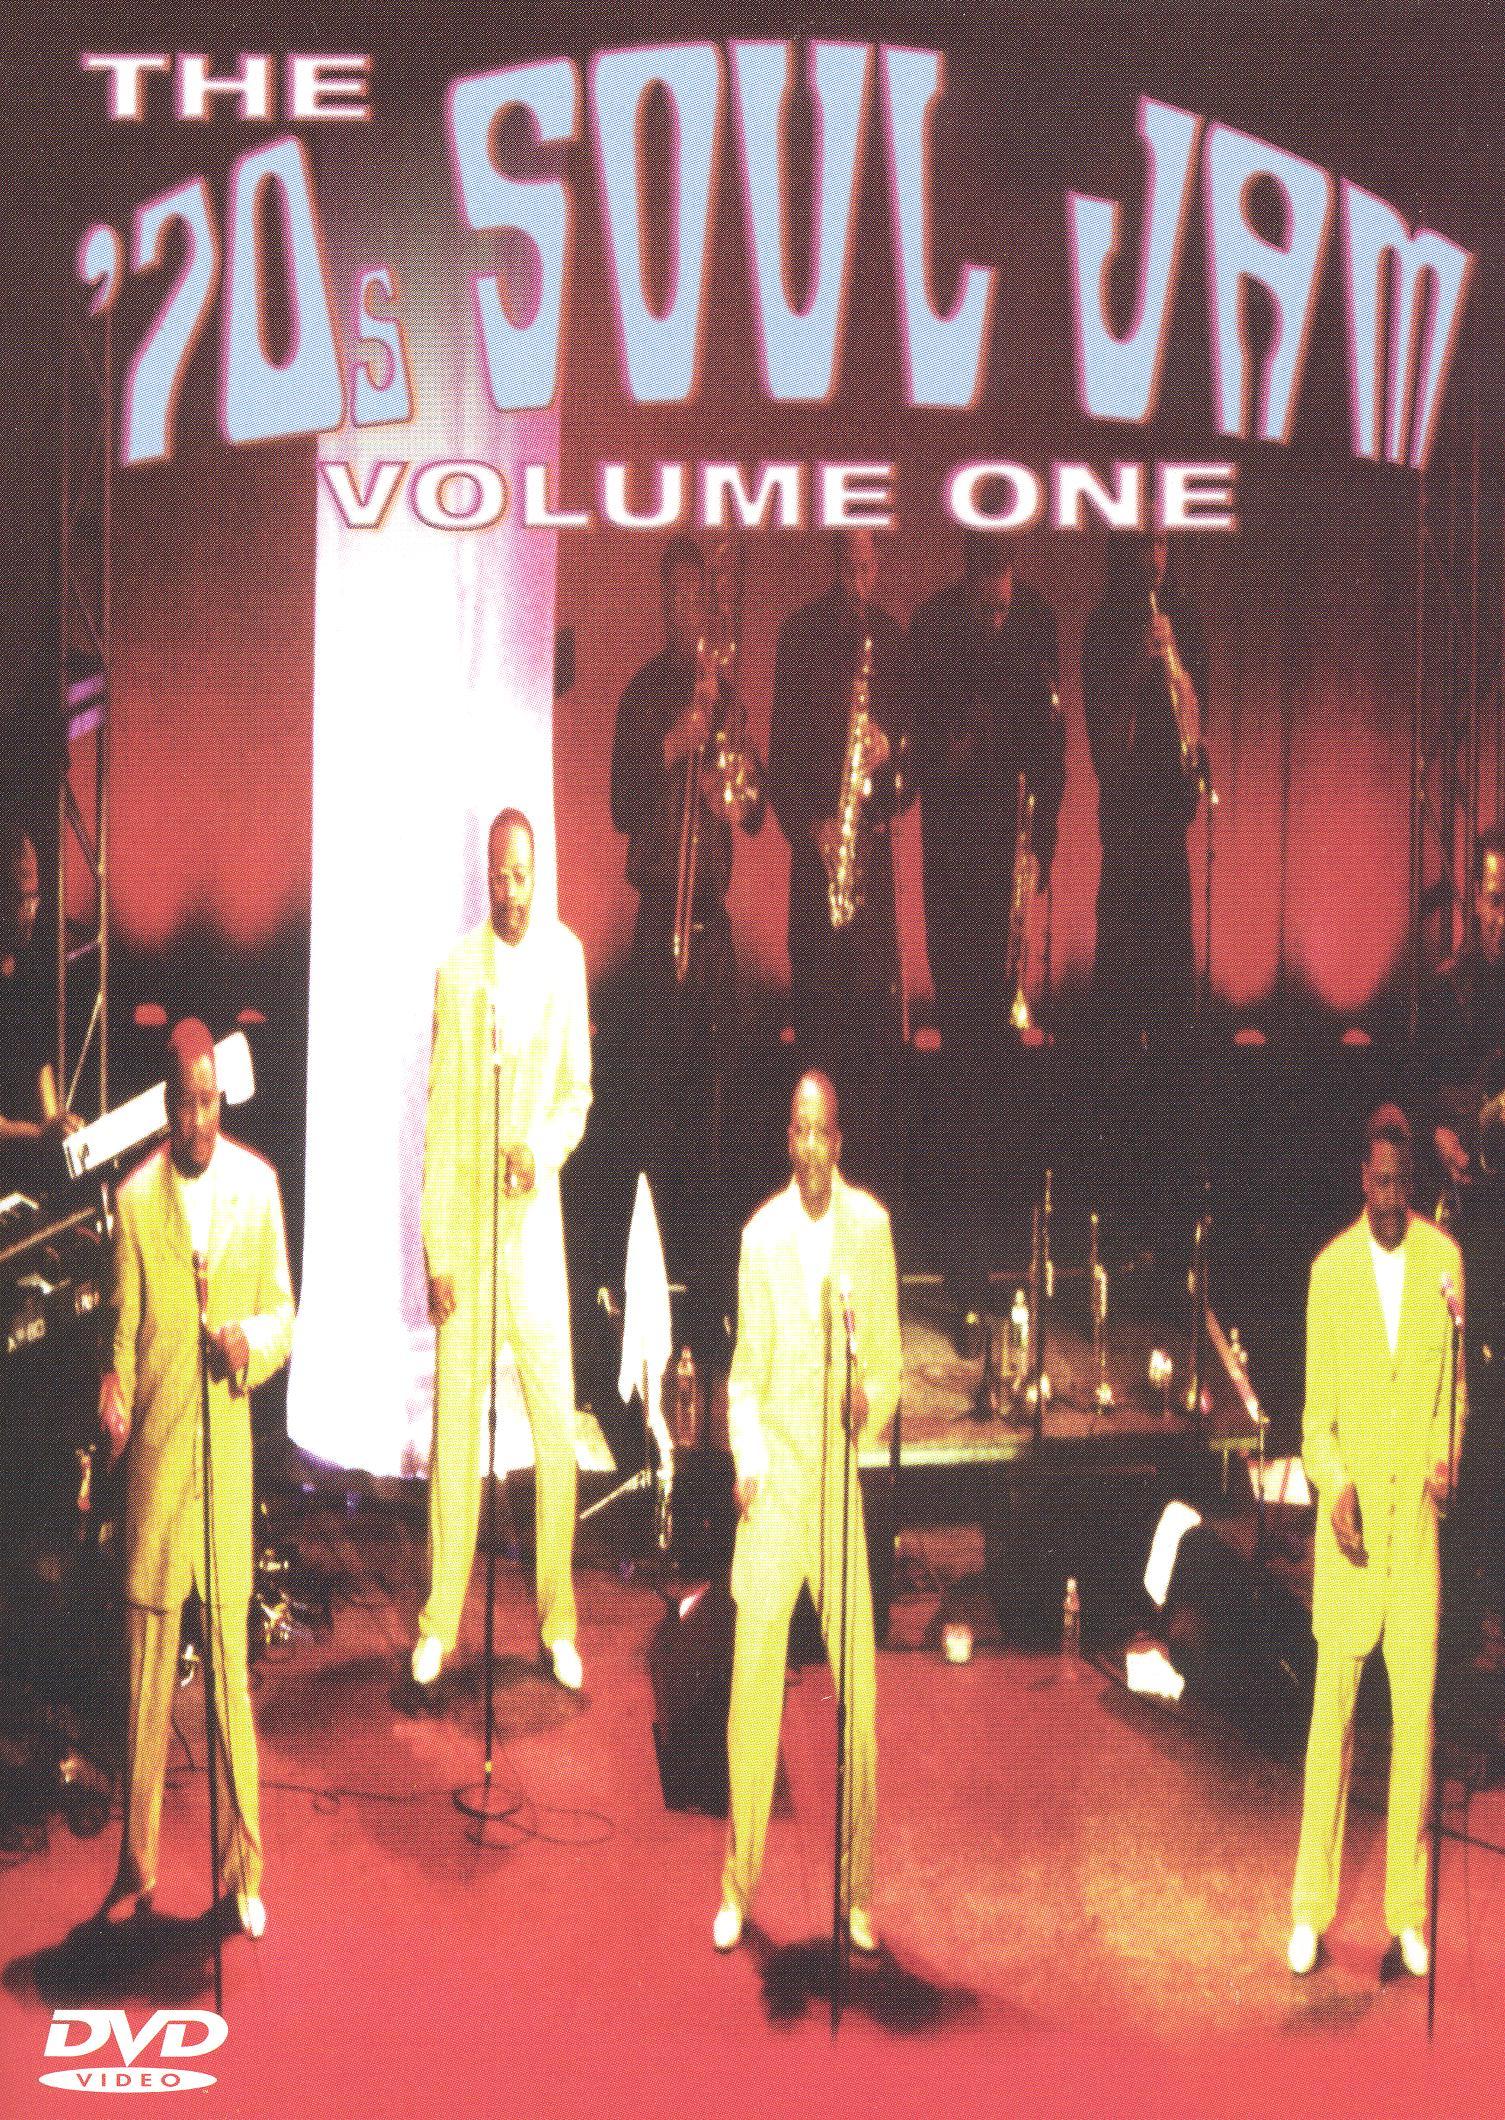 The '70s Soul Jam, Vol. 1